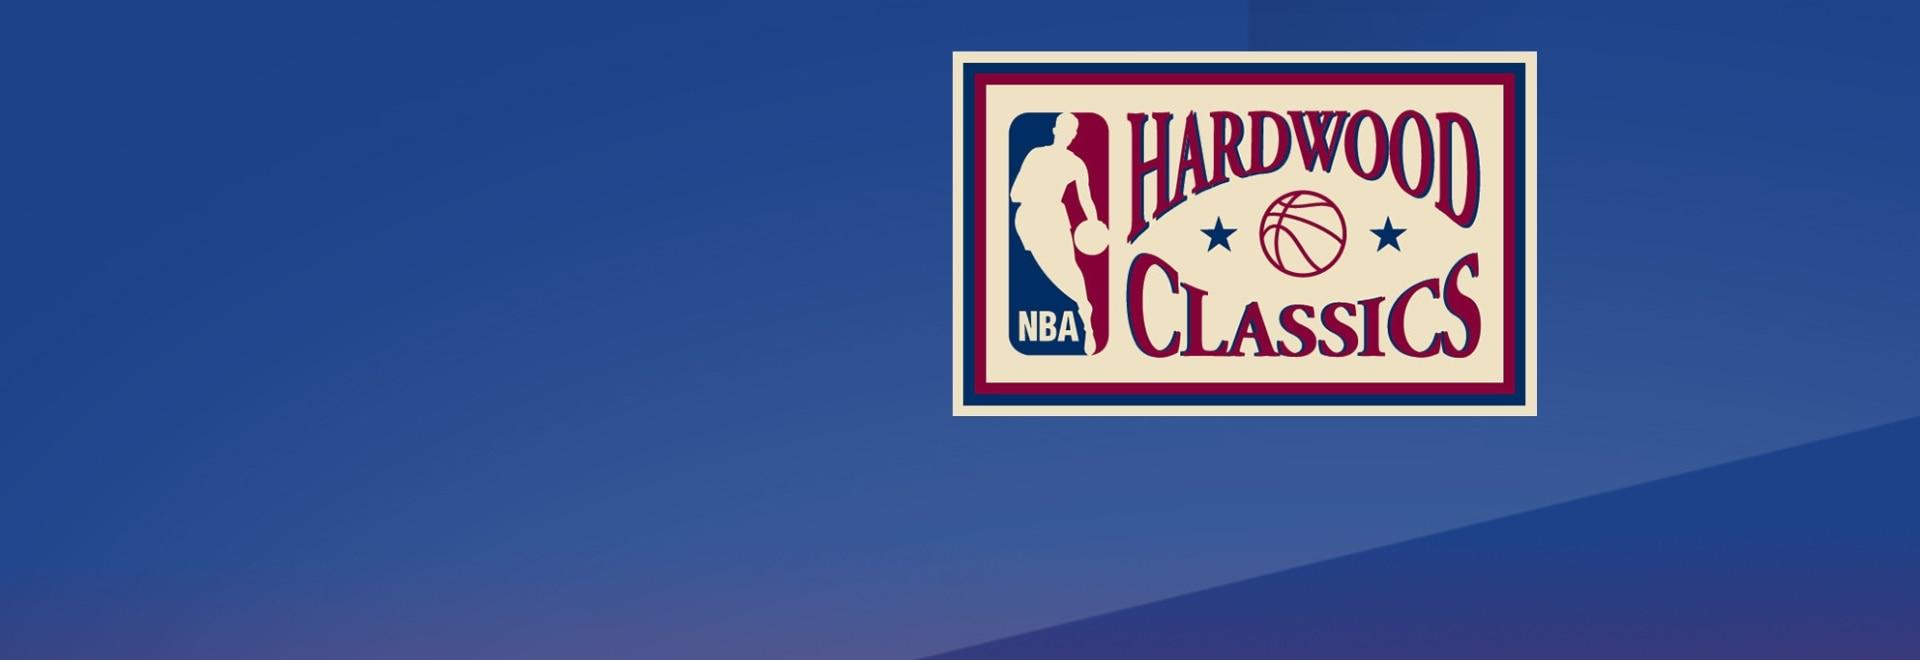 Spurs - Cavaliers 2007. Game 4. NBA Finals